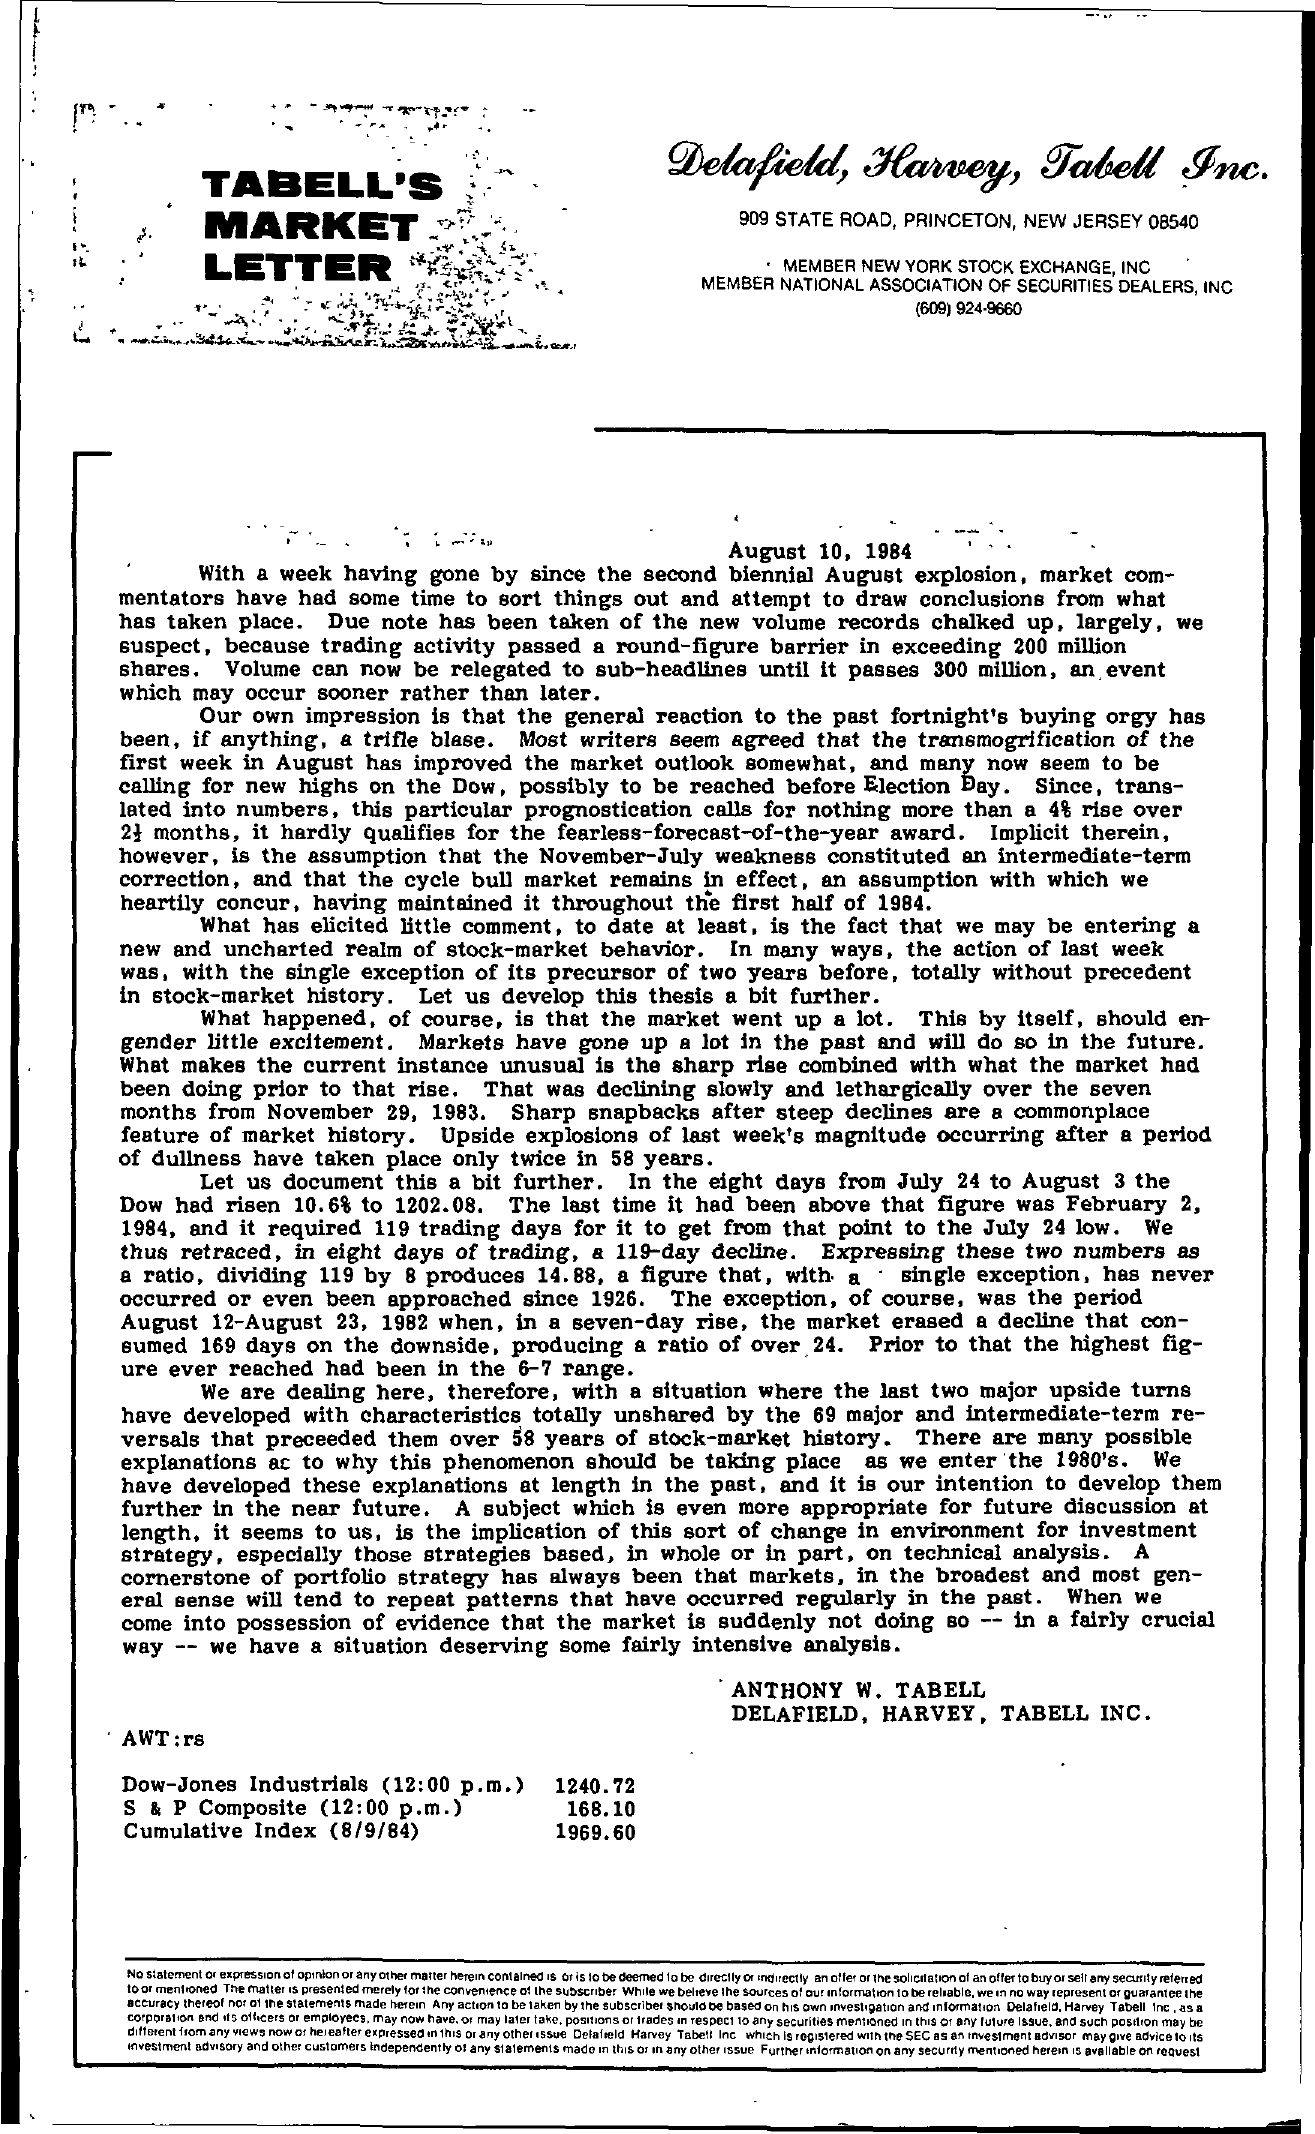 Tabell's Market Letter - August 10, 1984